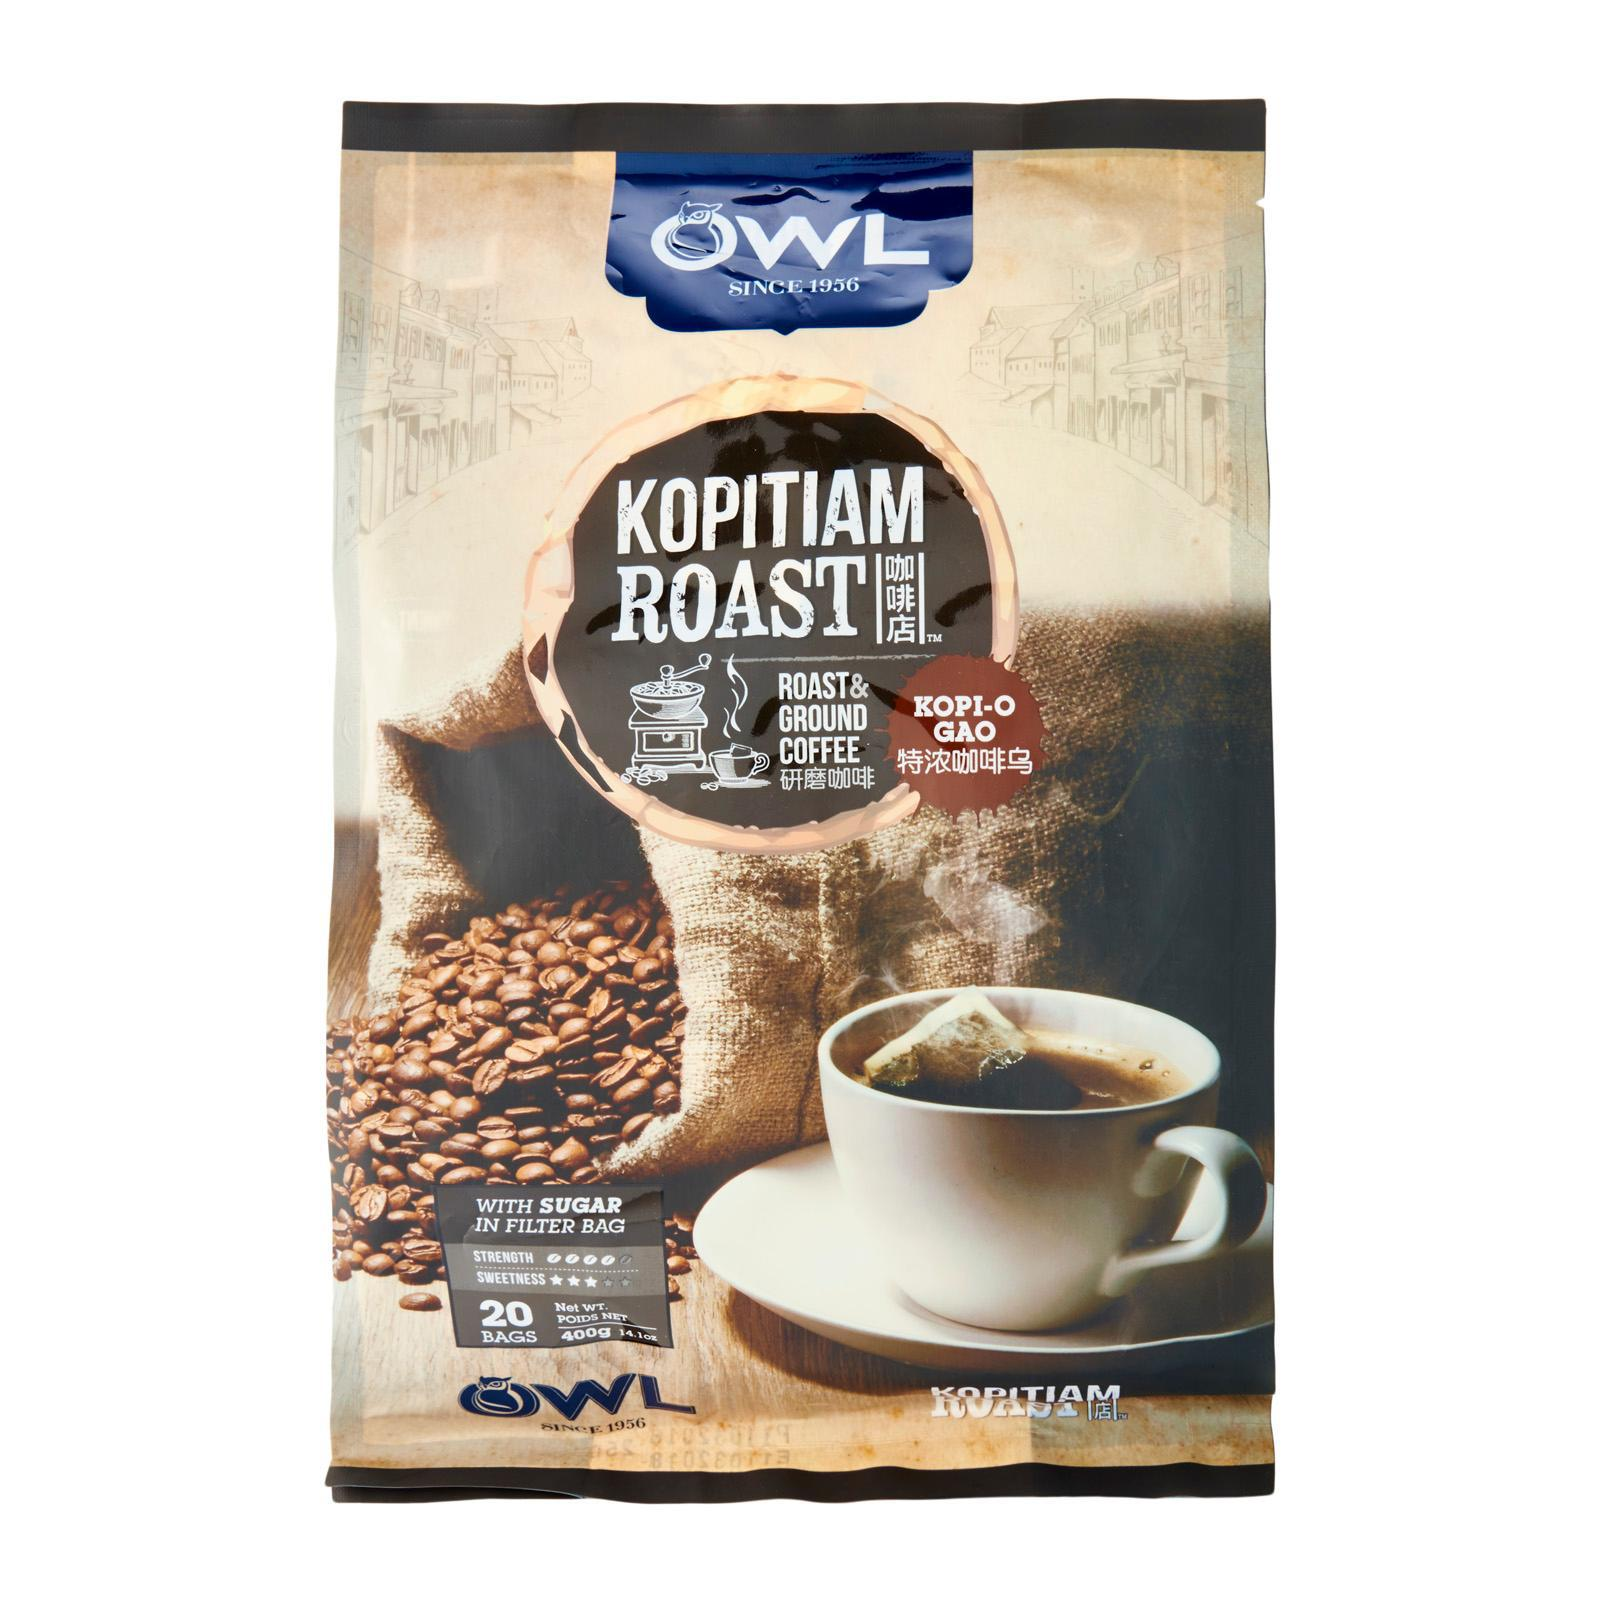 OWL Kopitiam Roast Instant Coffee Kopi O Gao Pack of 20